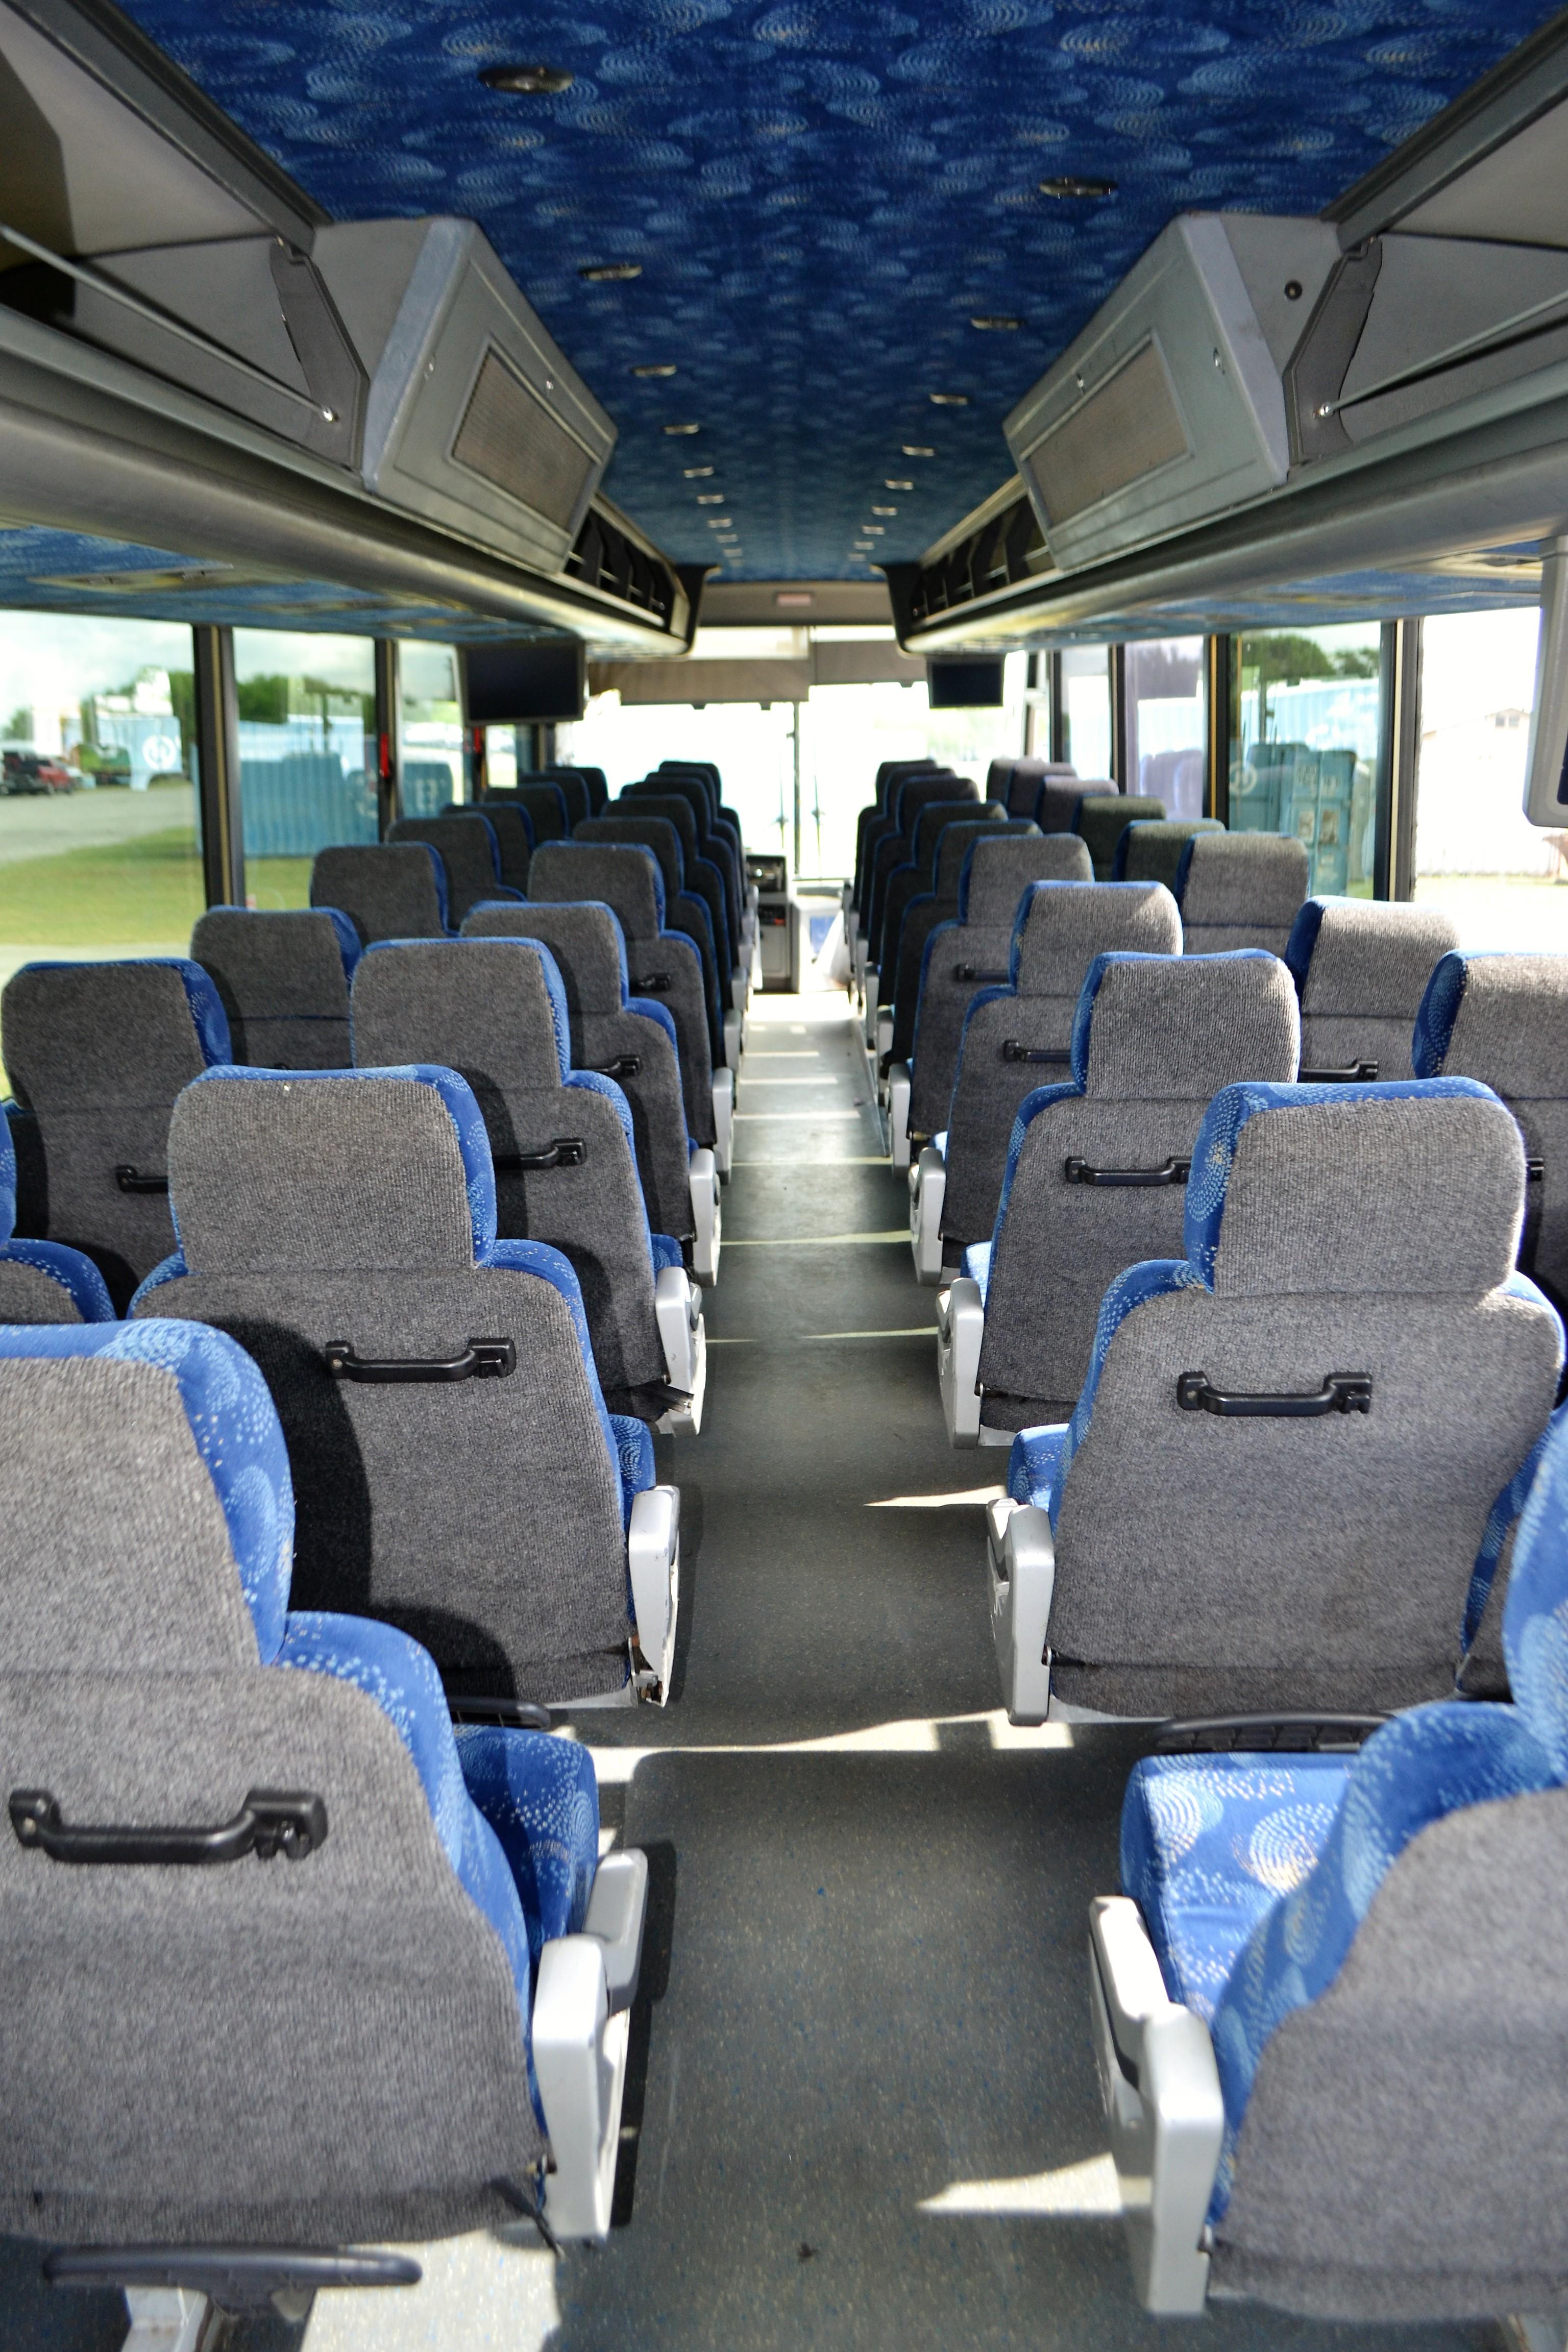 Lot 4 - 2006 Van Hool Commuter Bus # 257